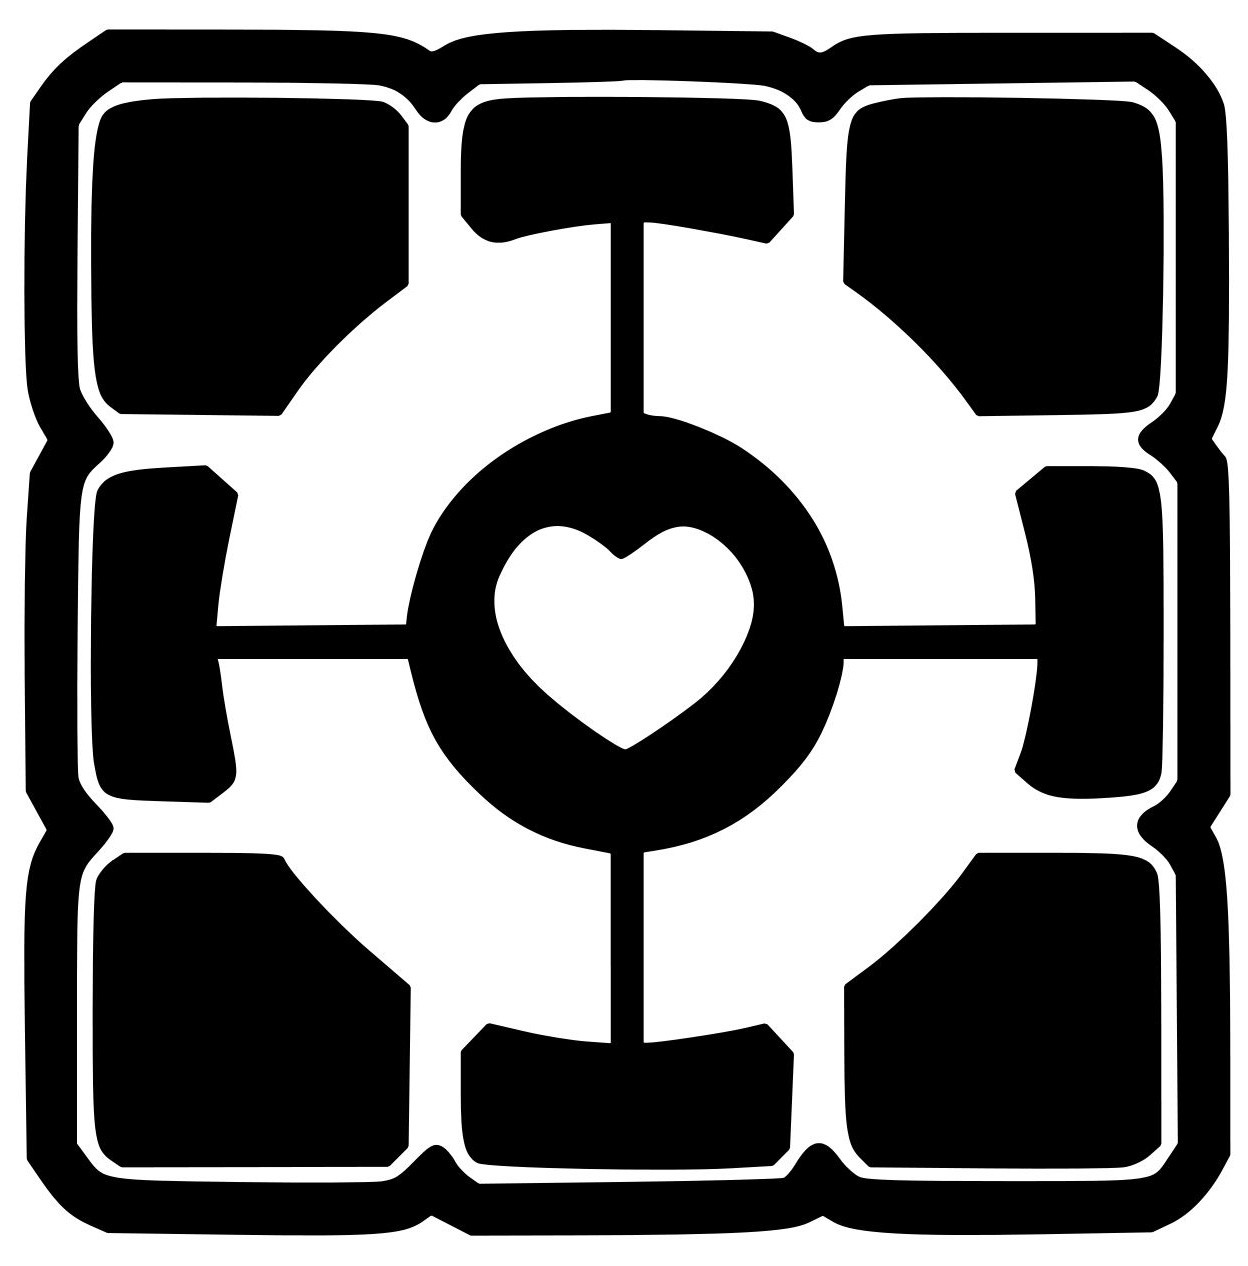 Portal 2 Companion Cube Vinyl Decal Sticker 4